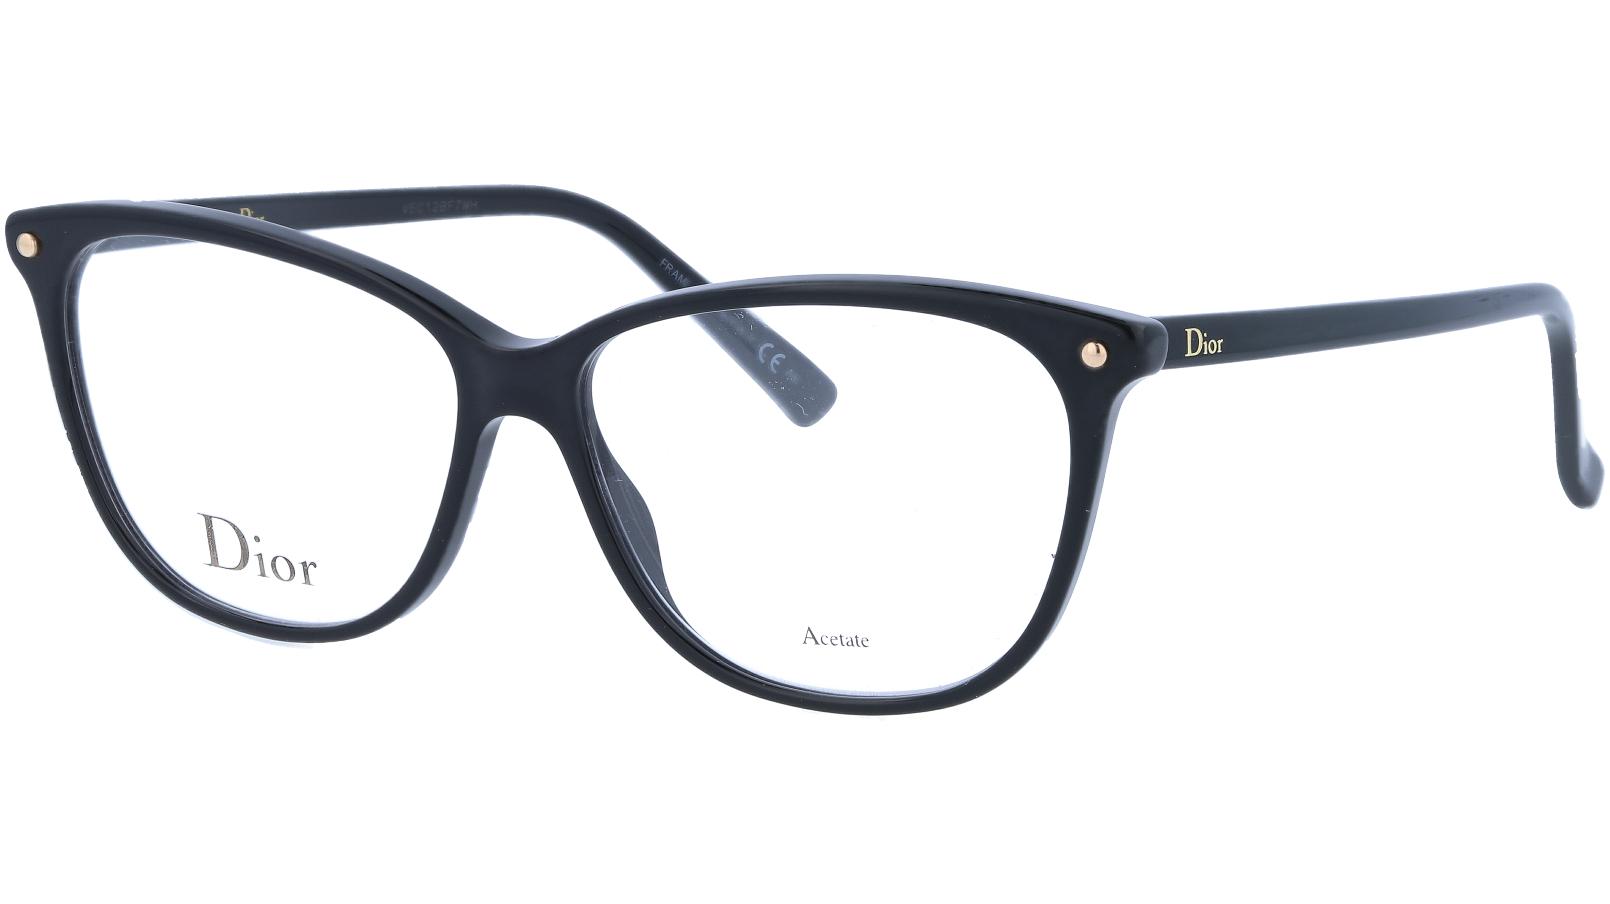 Dior CD3270 807 53 Black Glasses